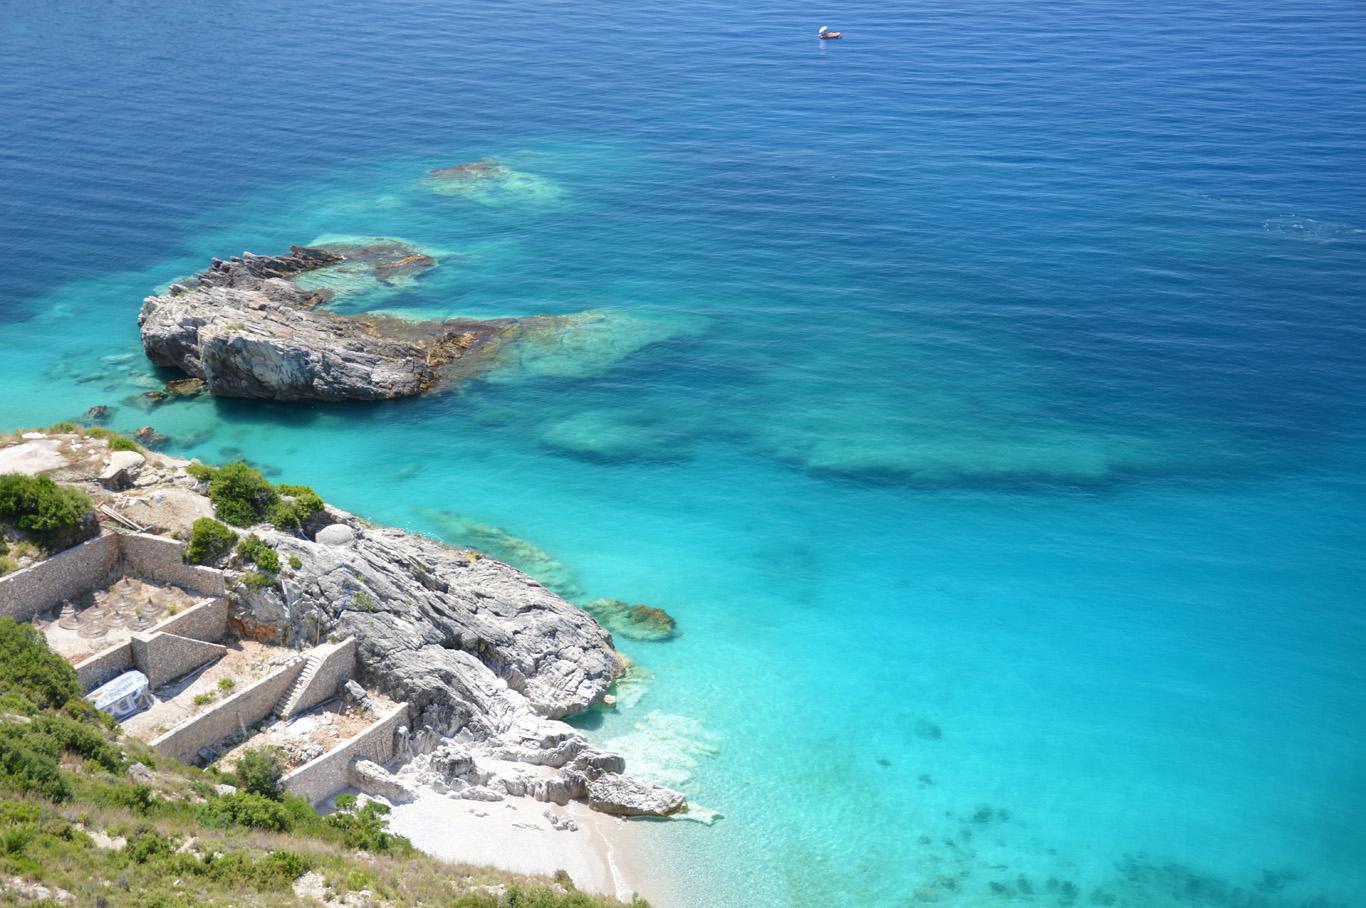 Incredibly blue sea